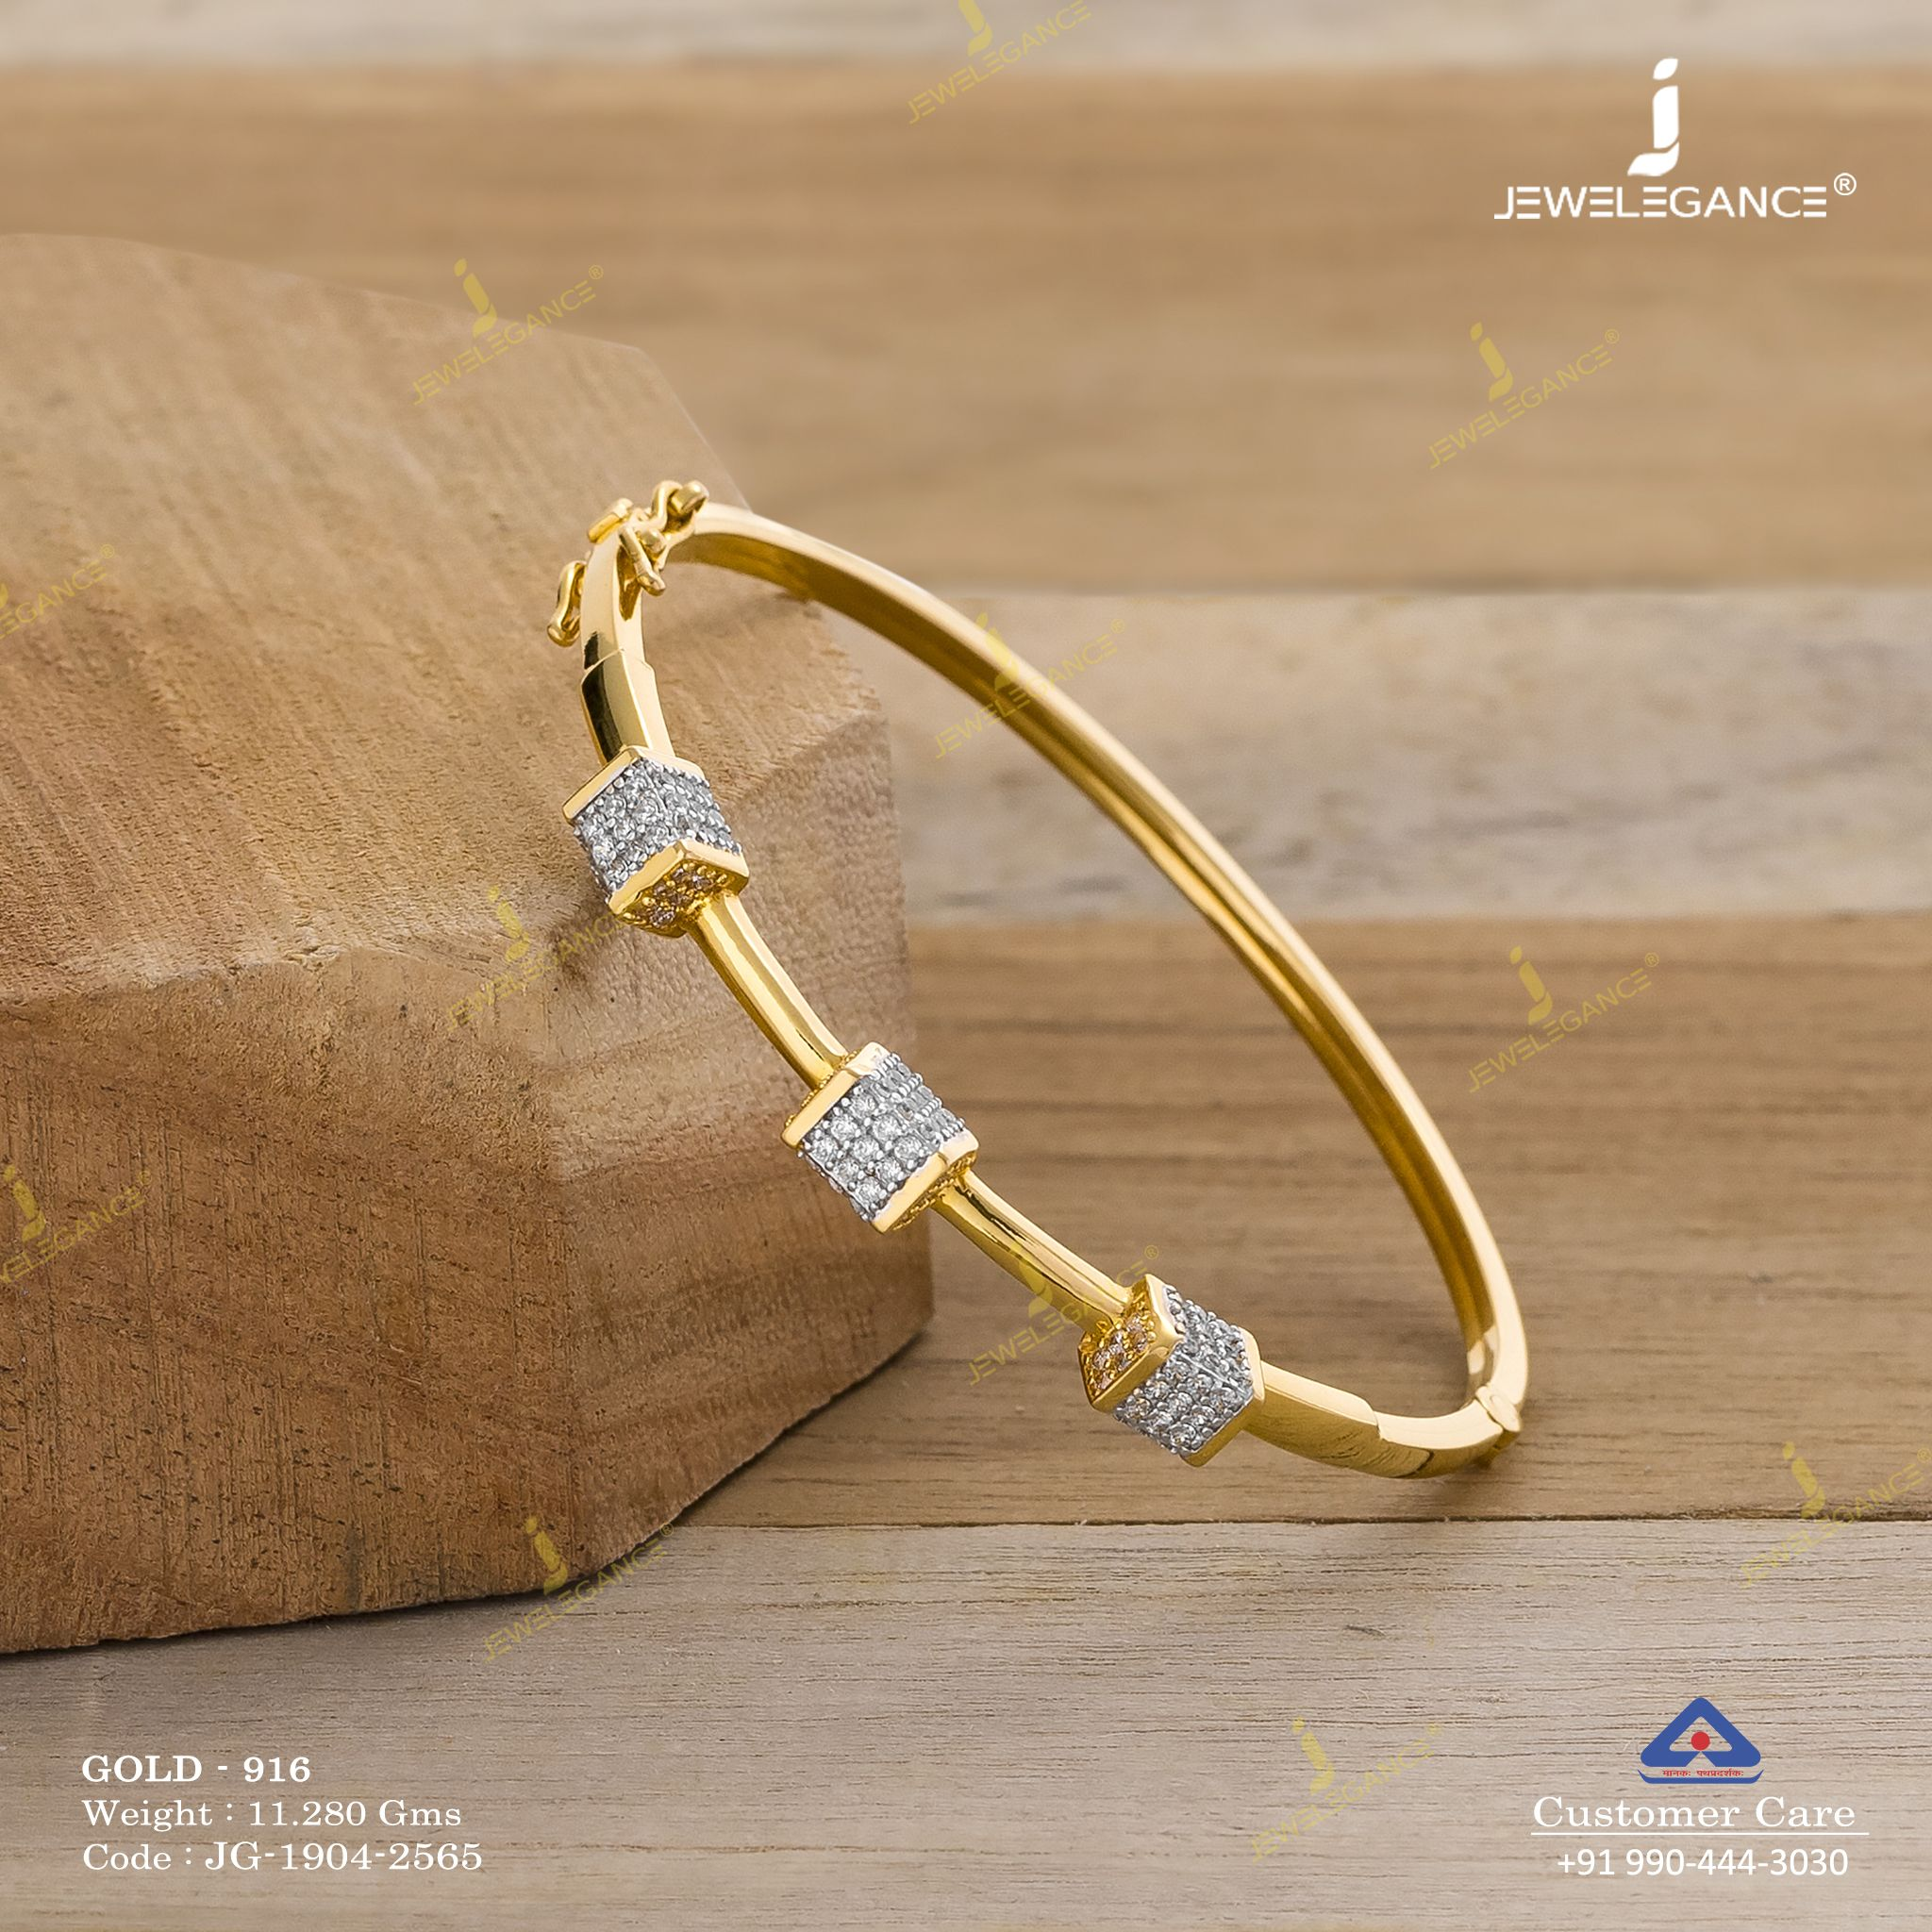 identification-bracelets Size 14K Yellow Gold HallMarked 9.25 inches IJ  SI 0.045 cttw Round-Cut-Diamond